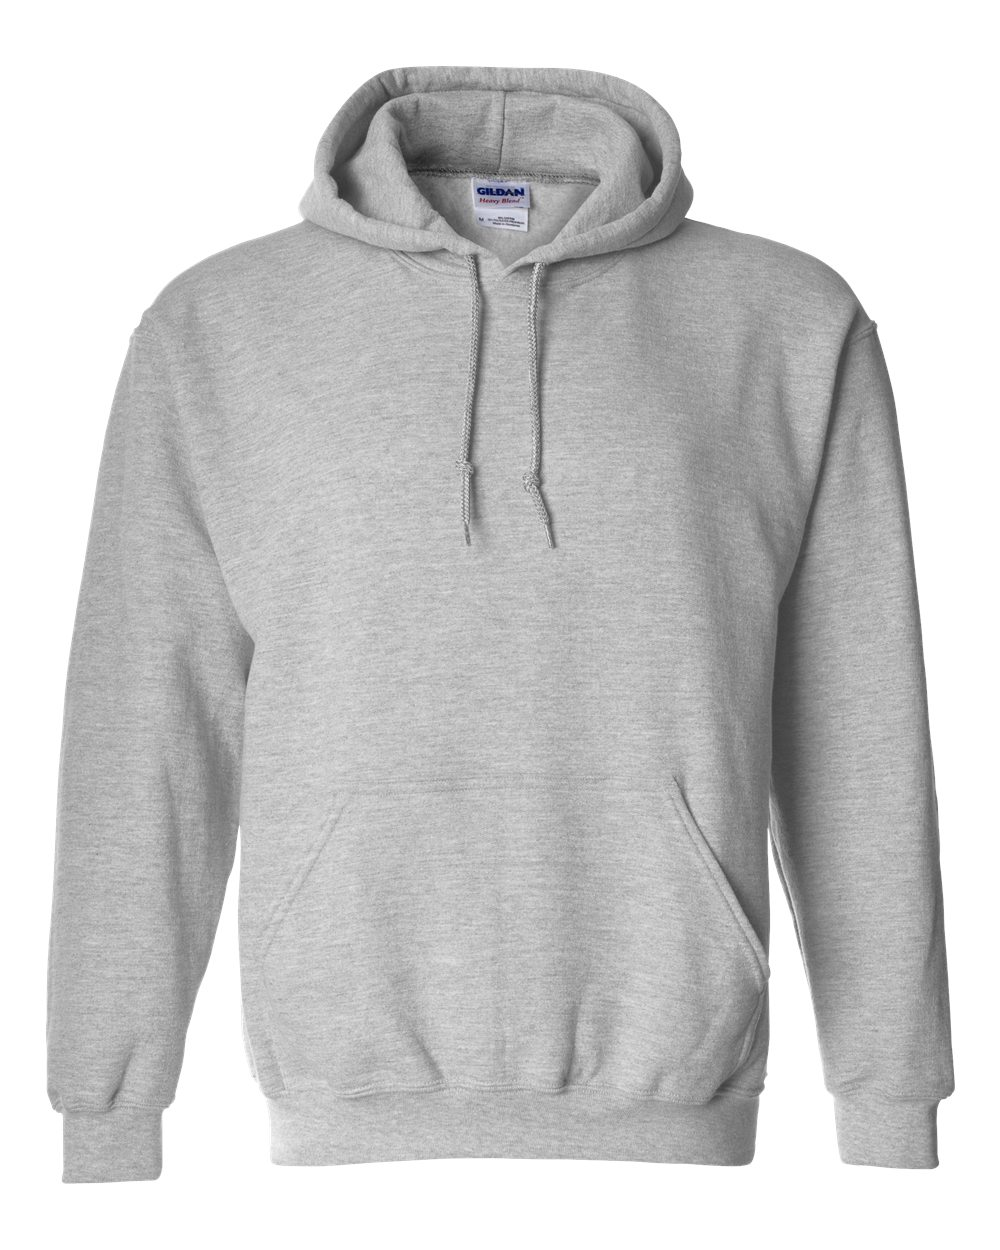 Gildan-Mens-Blank-Hoodie-Heavy-Blend-Hooded-Sweatshirt-Solid-18500-up-to-5XL thumbnail 95